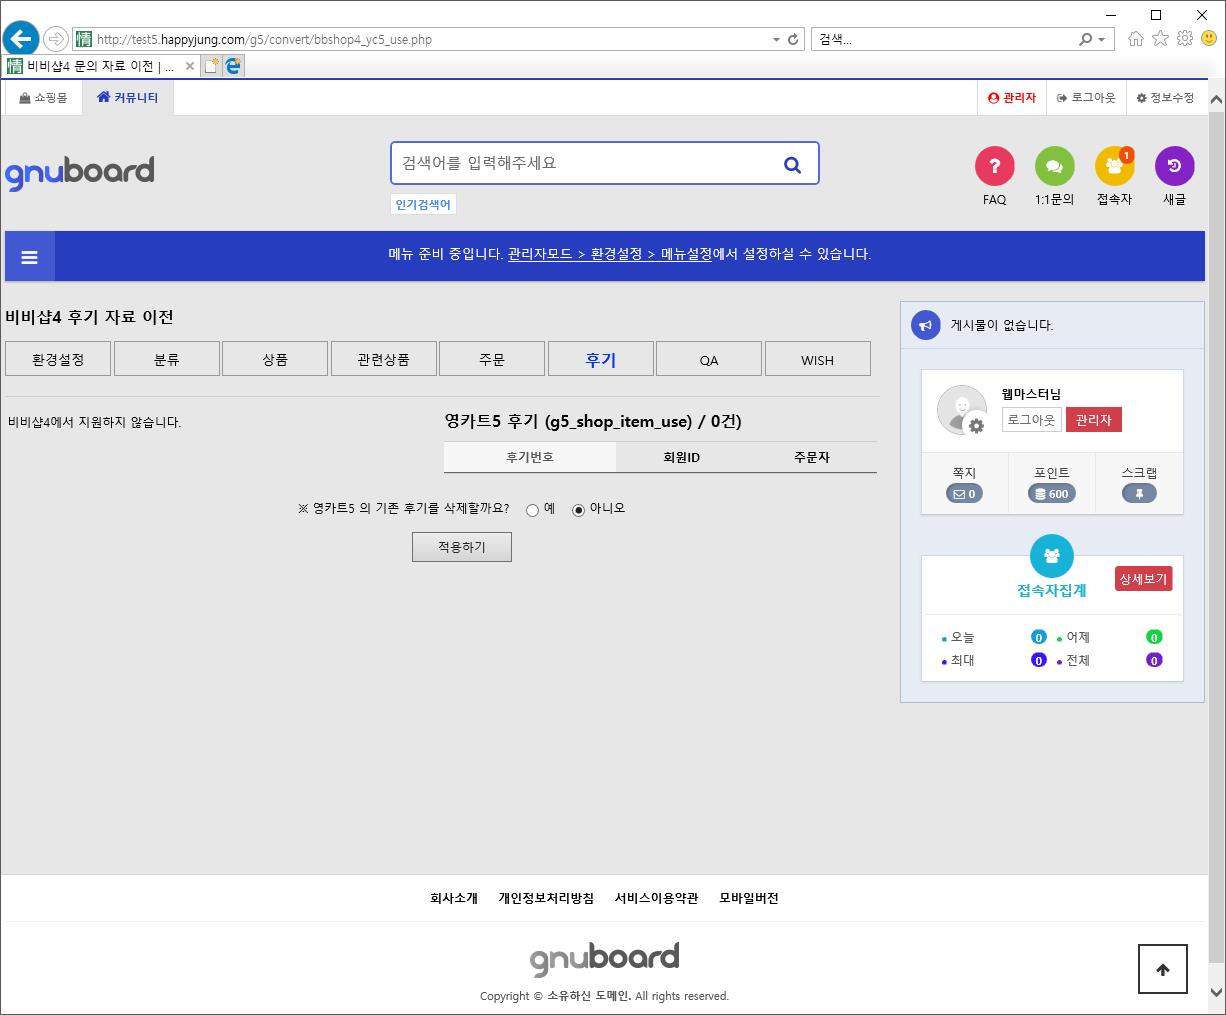 convert_bbshop4_yc5_use.png